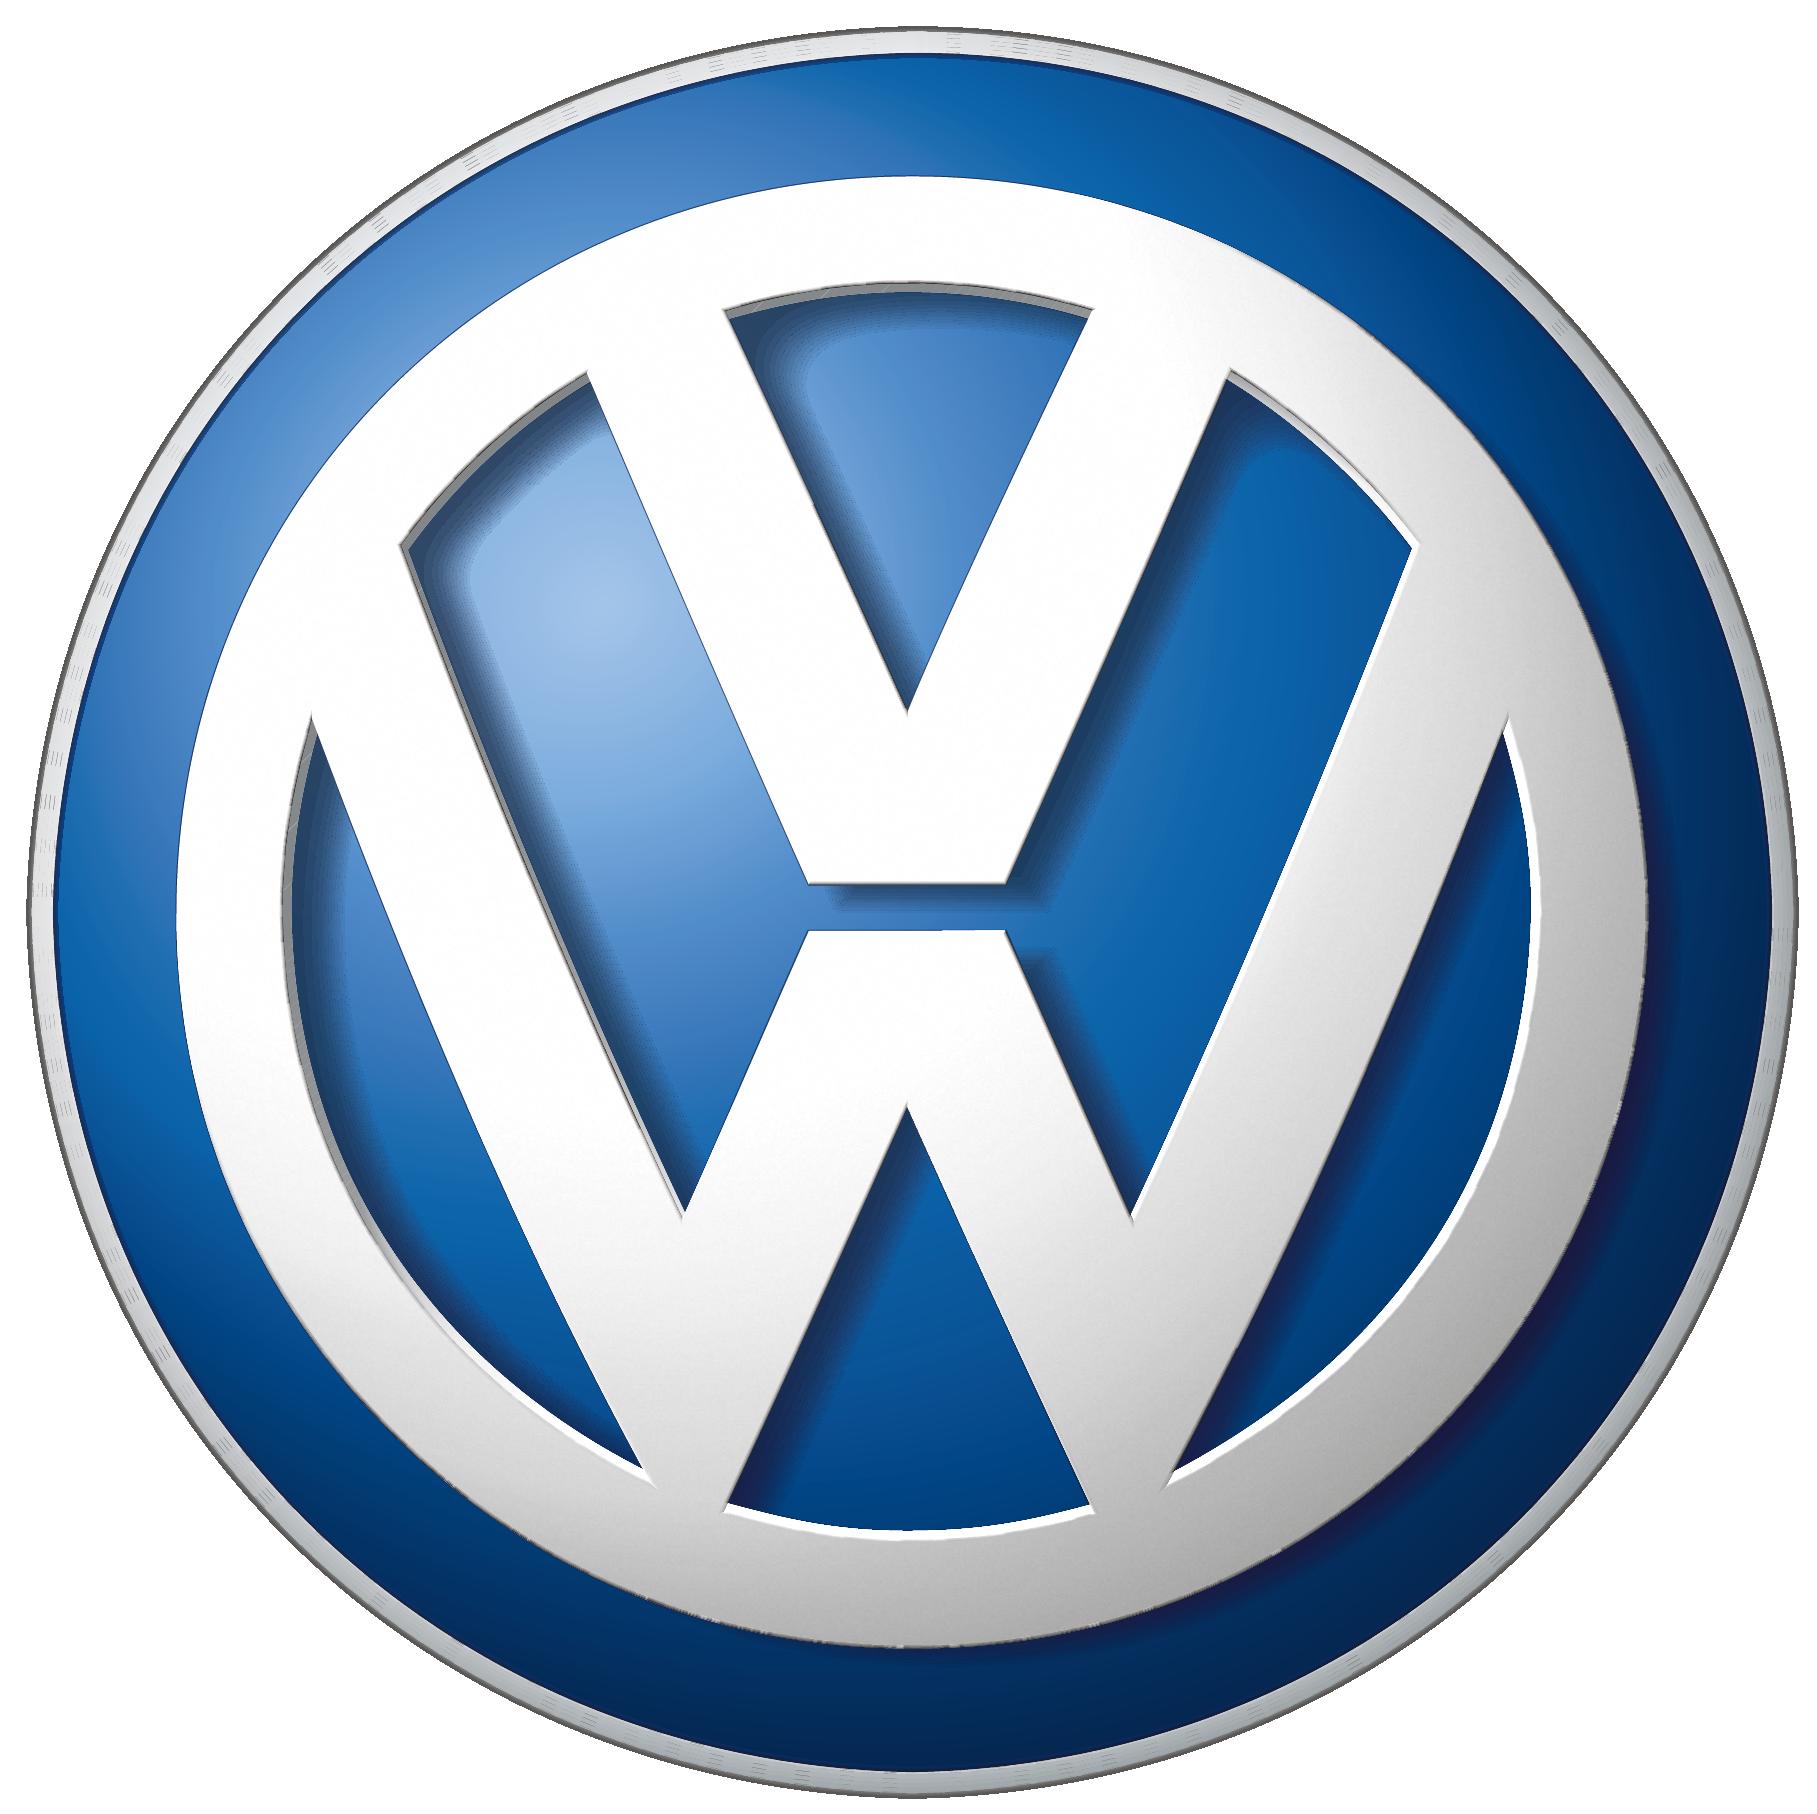 Clipart car logo. Cars brands png images